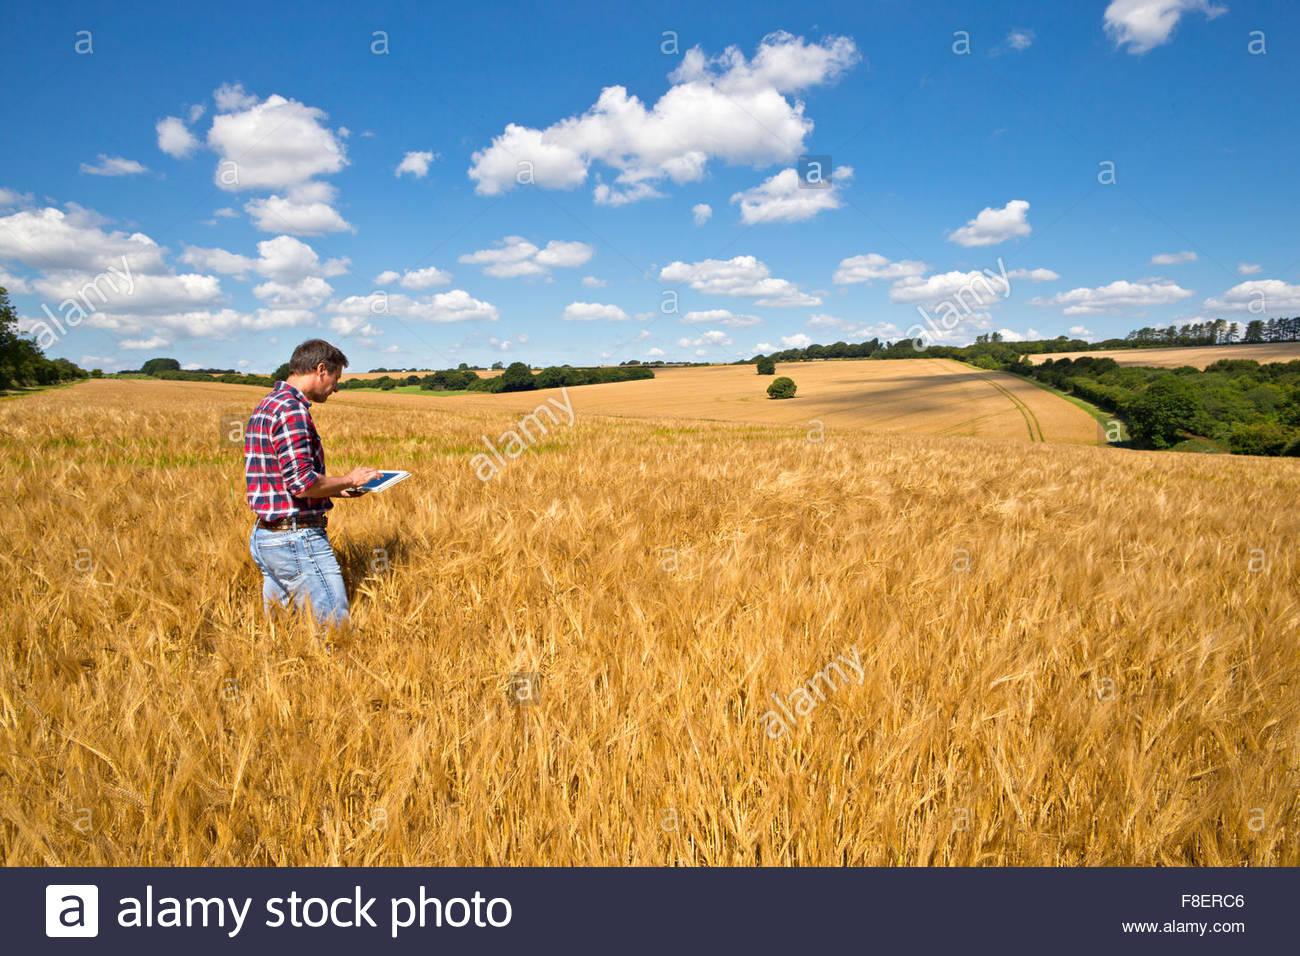 Farmer using digital tablet in sunny rural barley crop field in summer - Stock Image